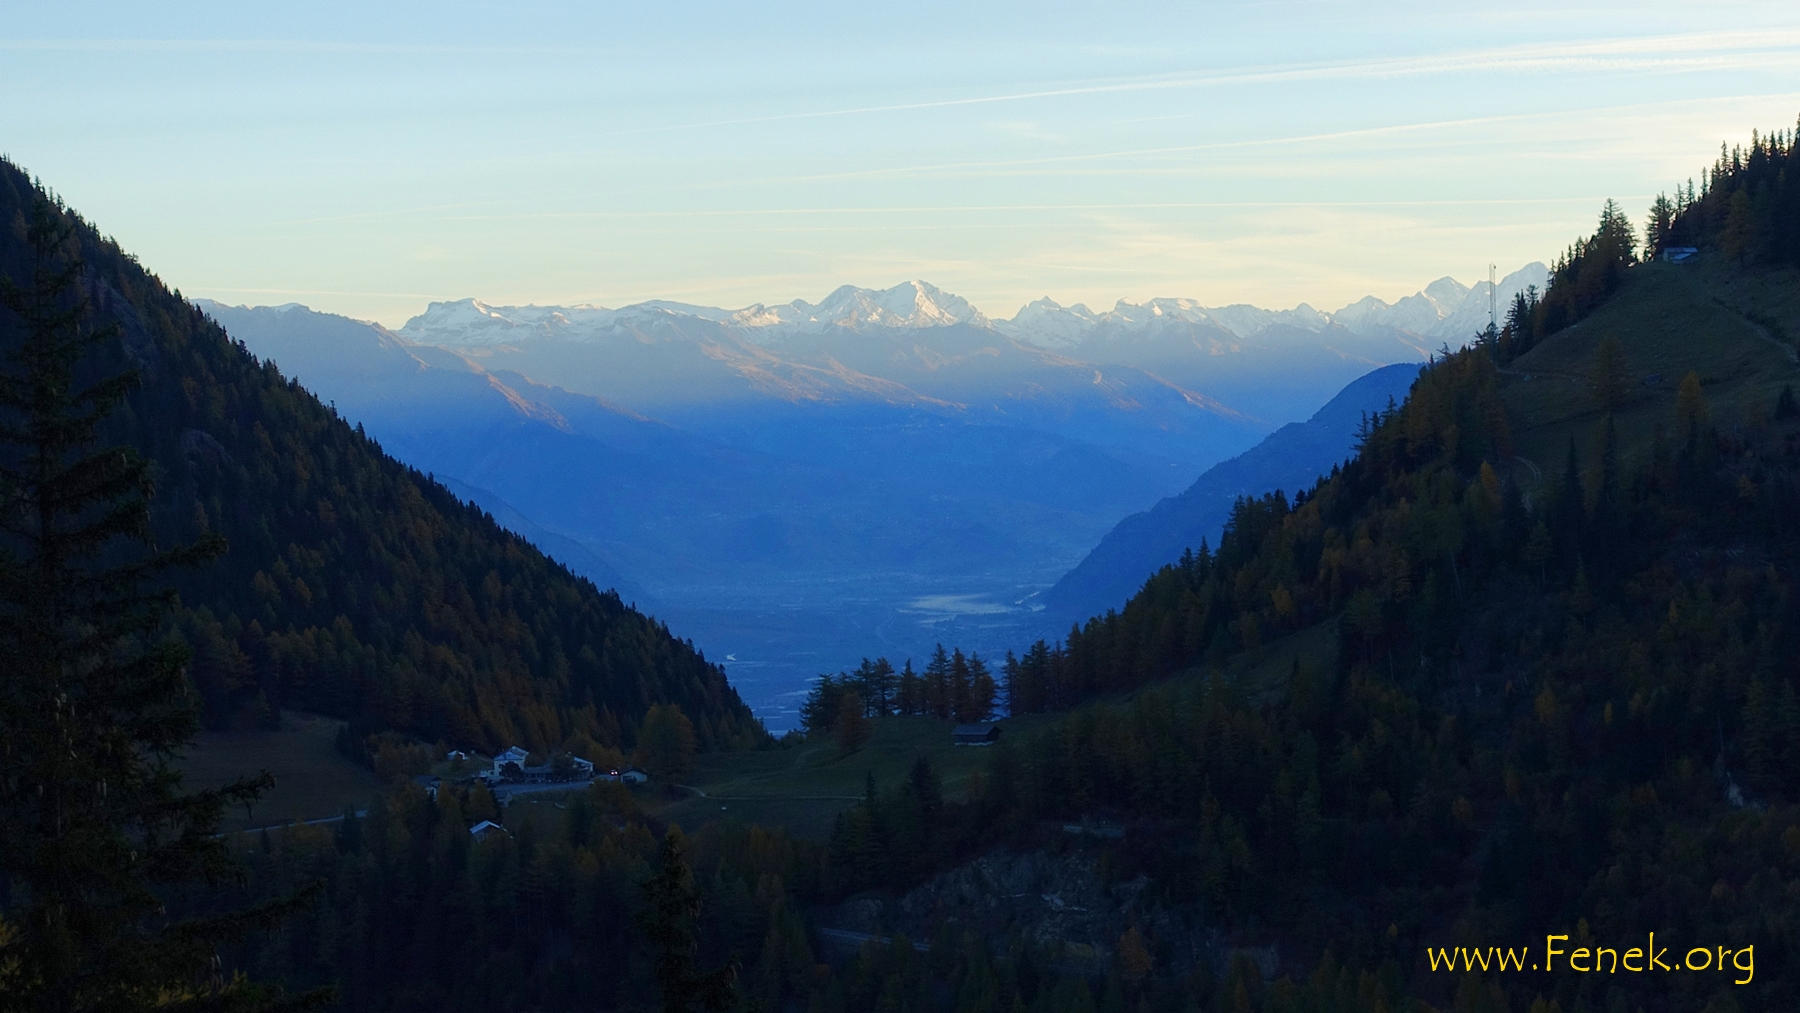 der Tag erwacht über dem Col de la Forclaz